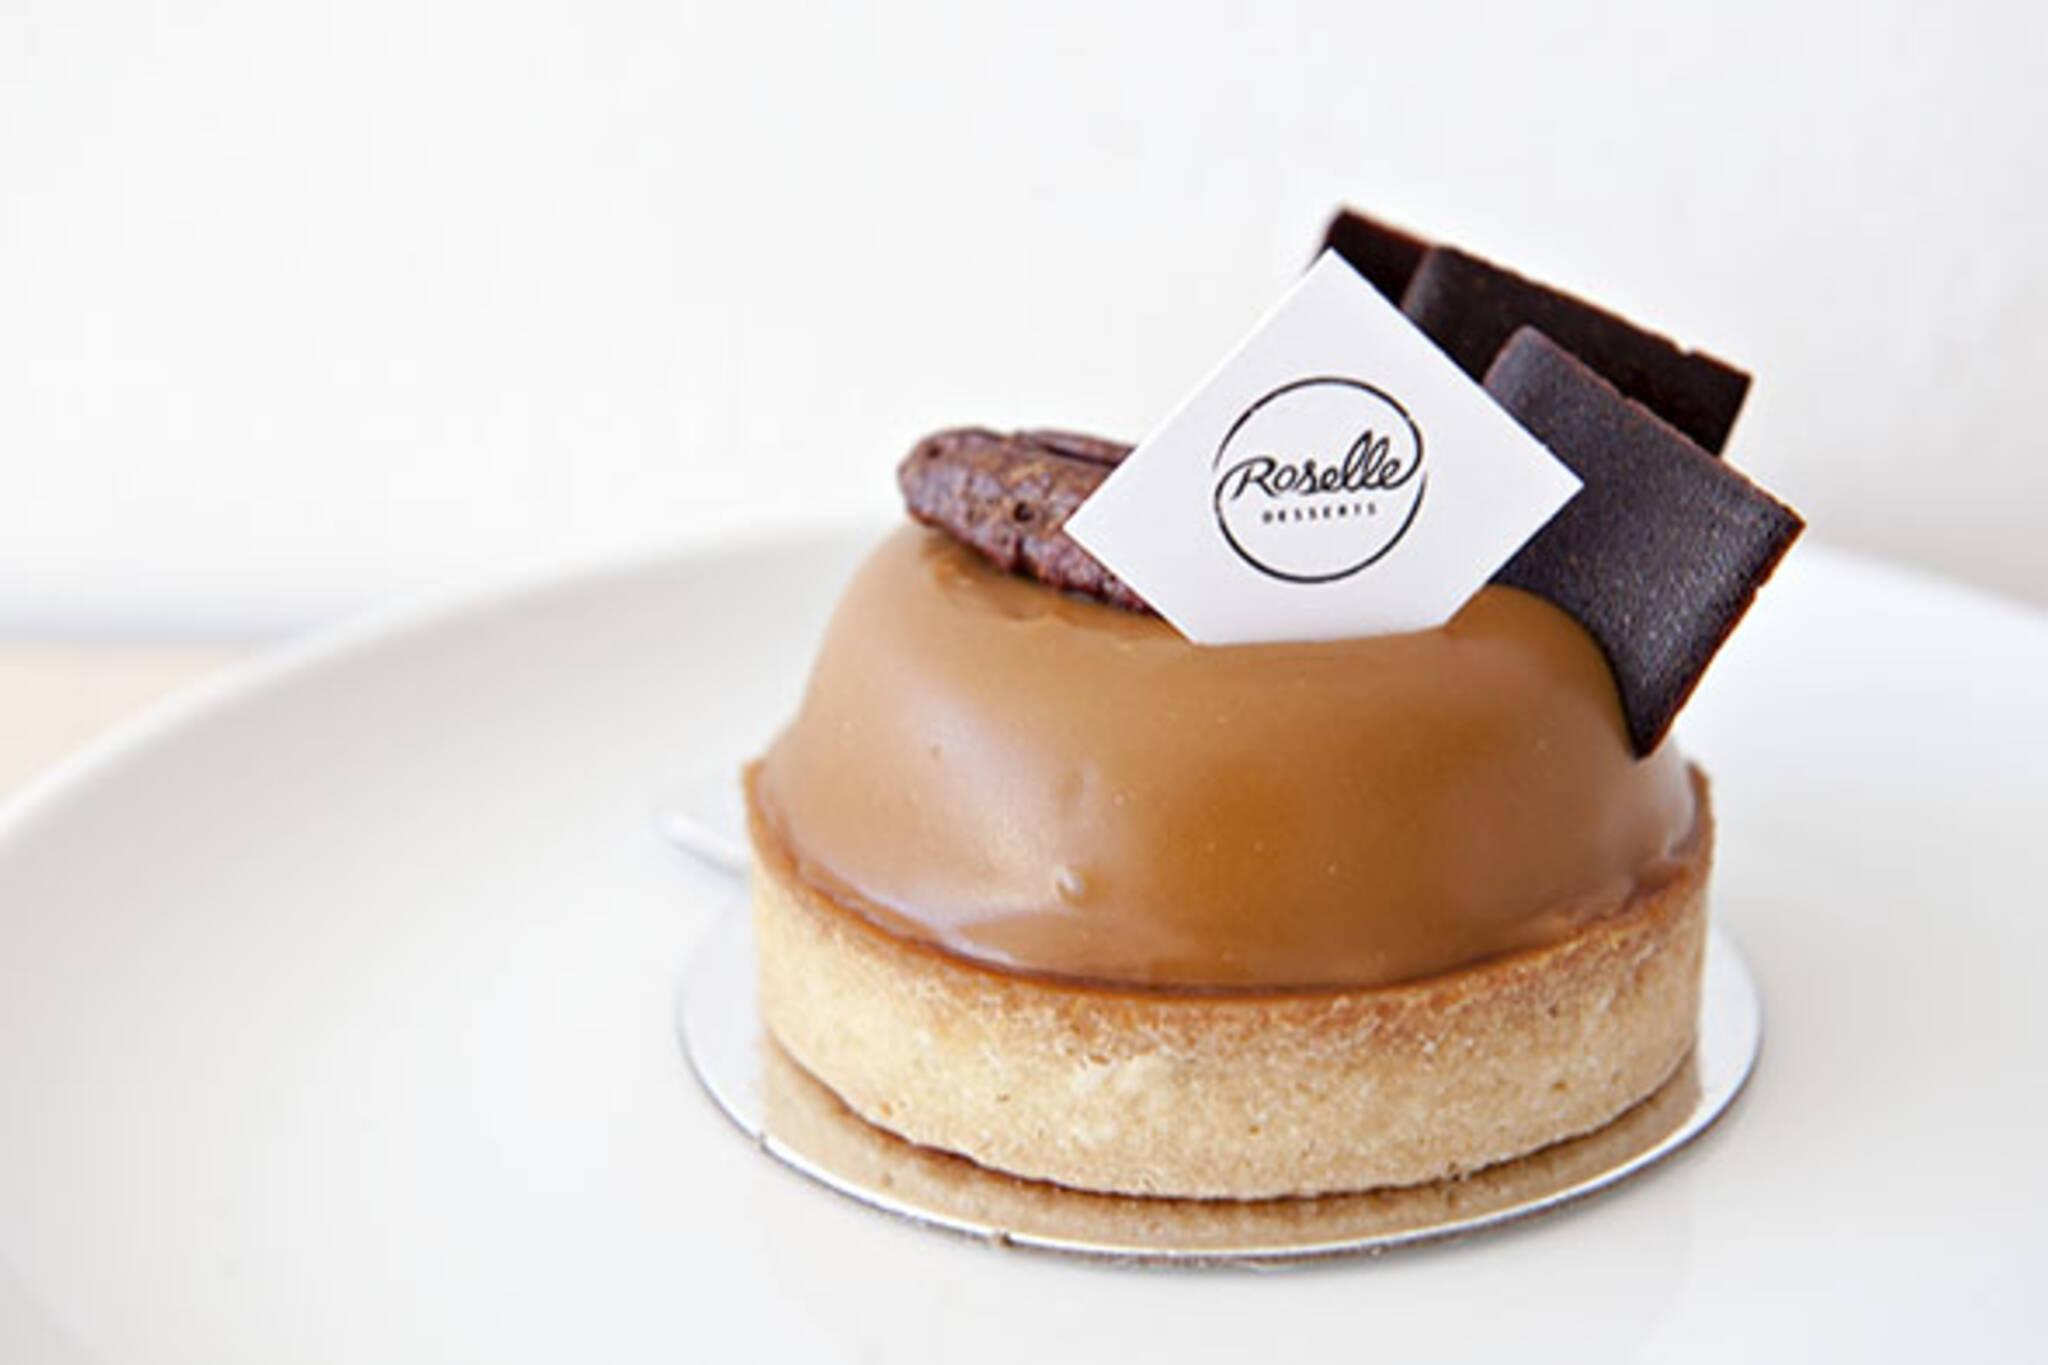 roselle desserts toronto